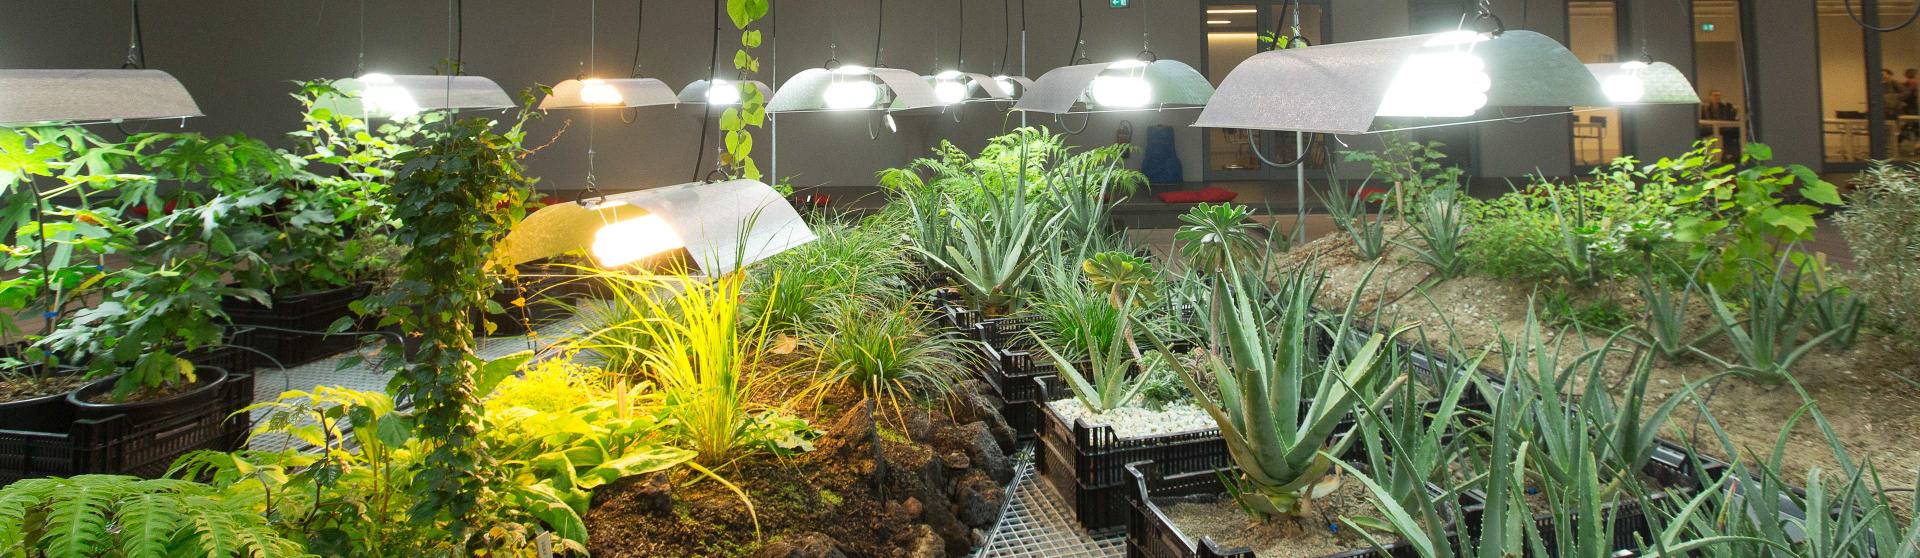 Der garten der diaspora j disches museum berlin for Berlin pflanzen